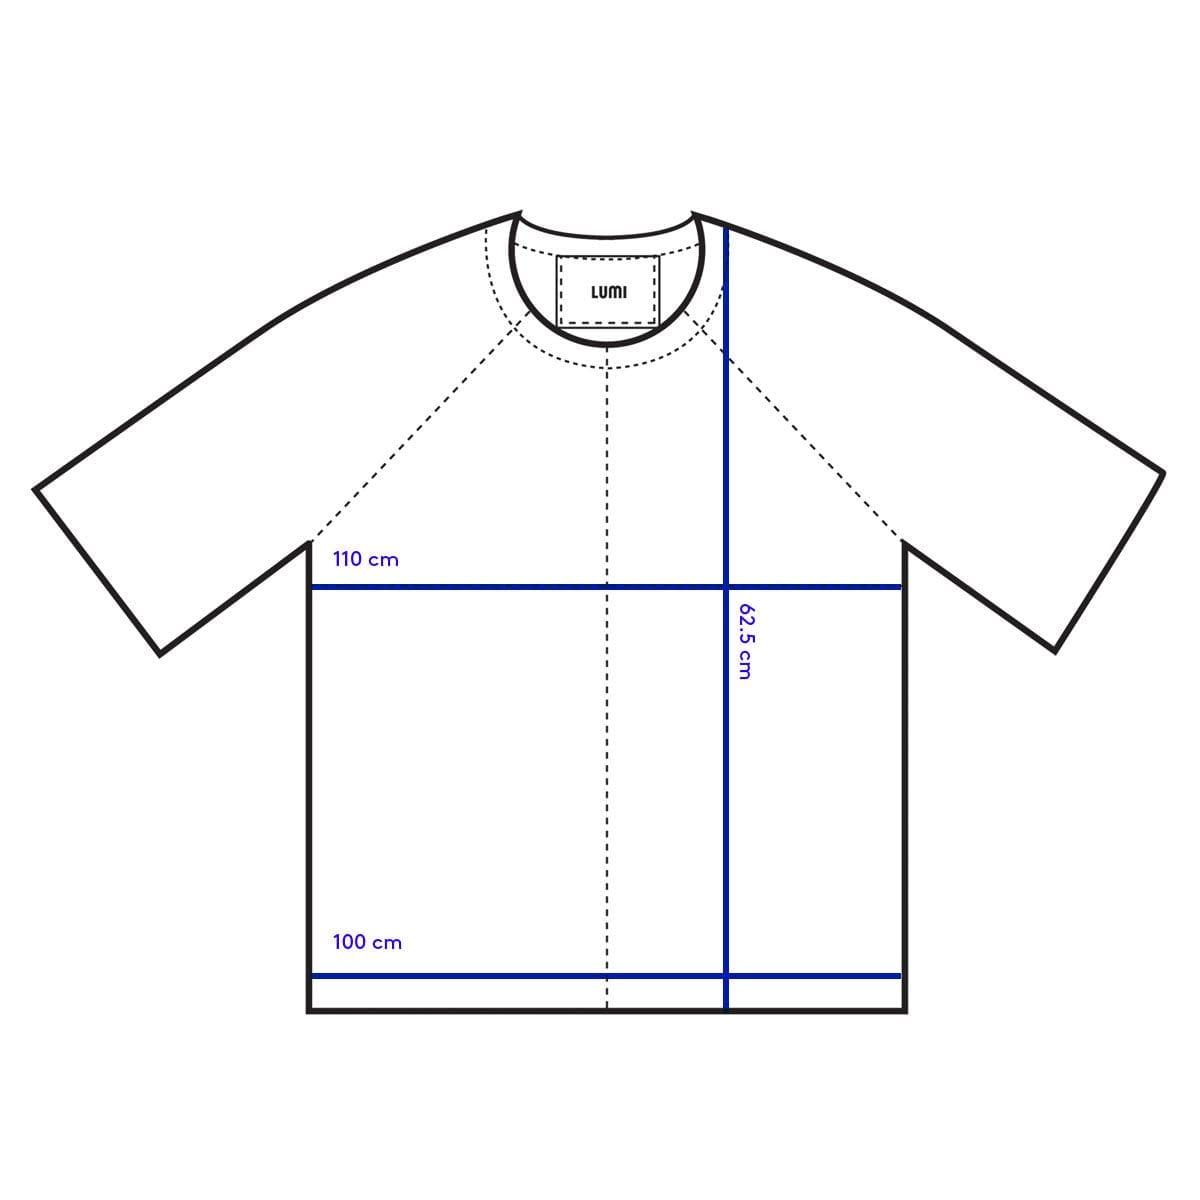 LUMI Leather Garments T-Shirt (medium) measurements